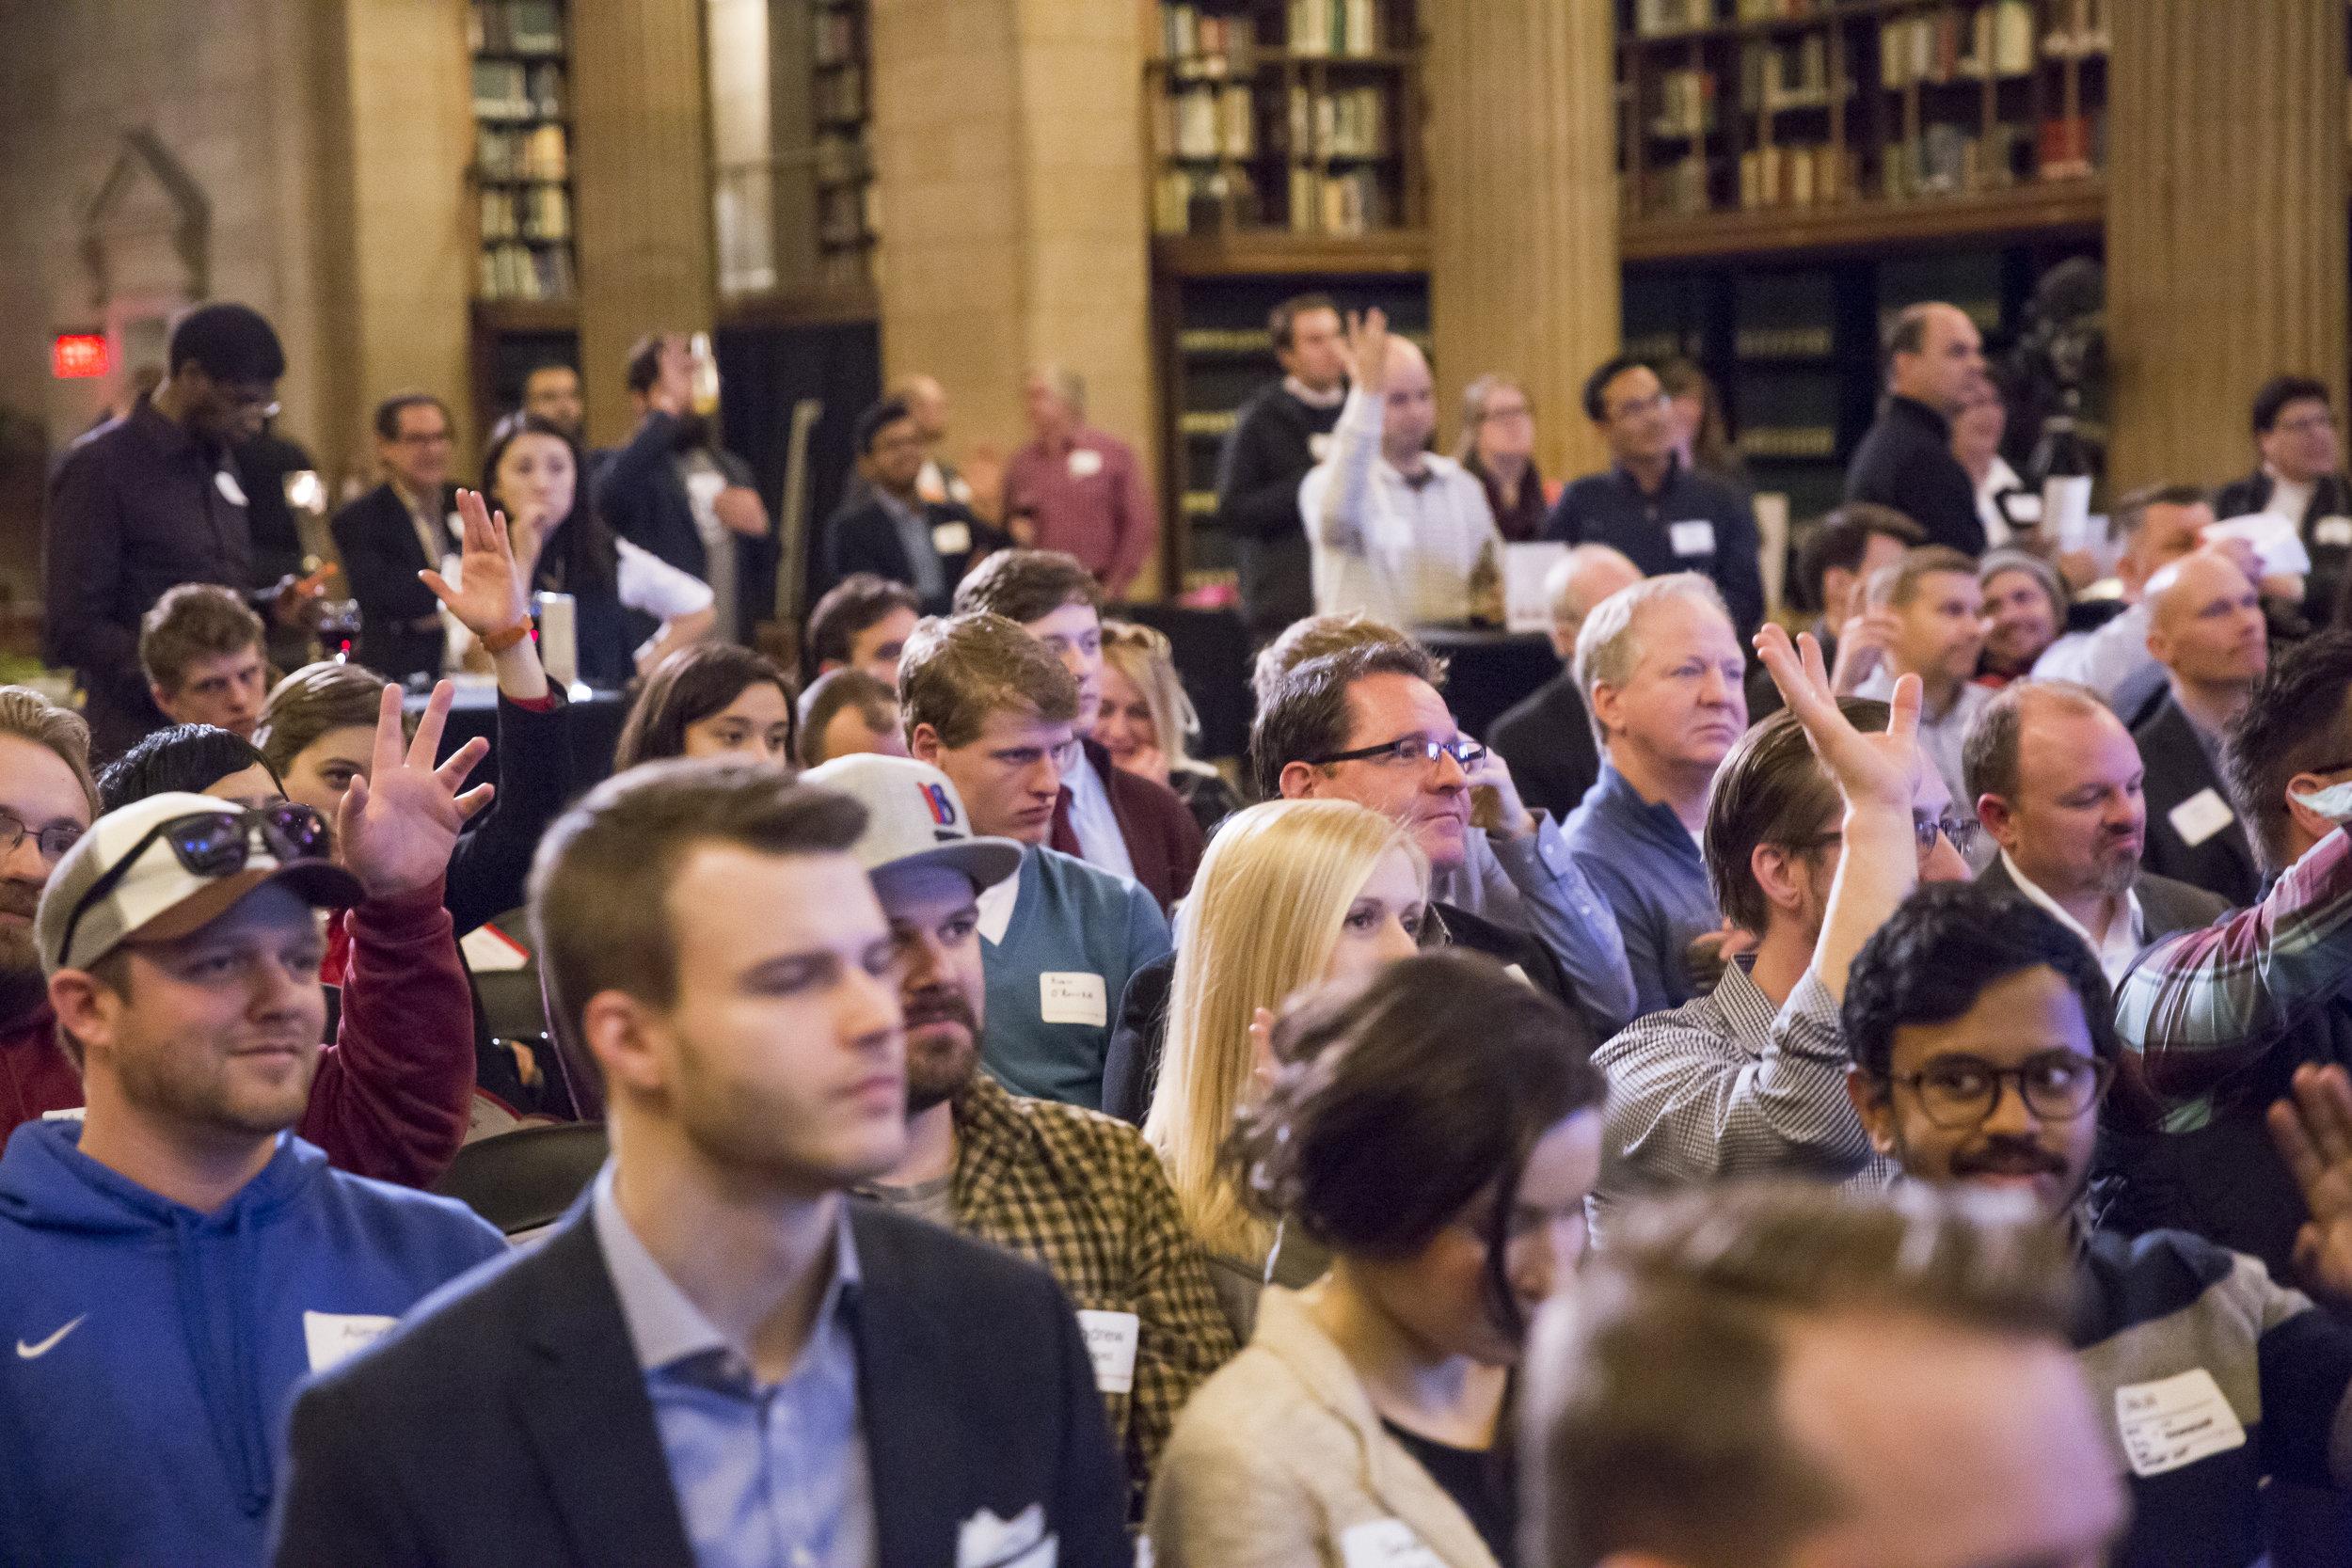 crowd raising hands.jpg